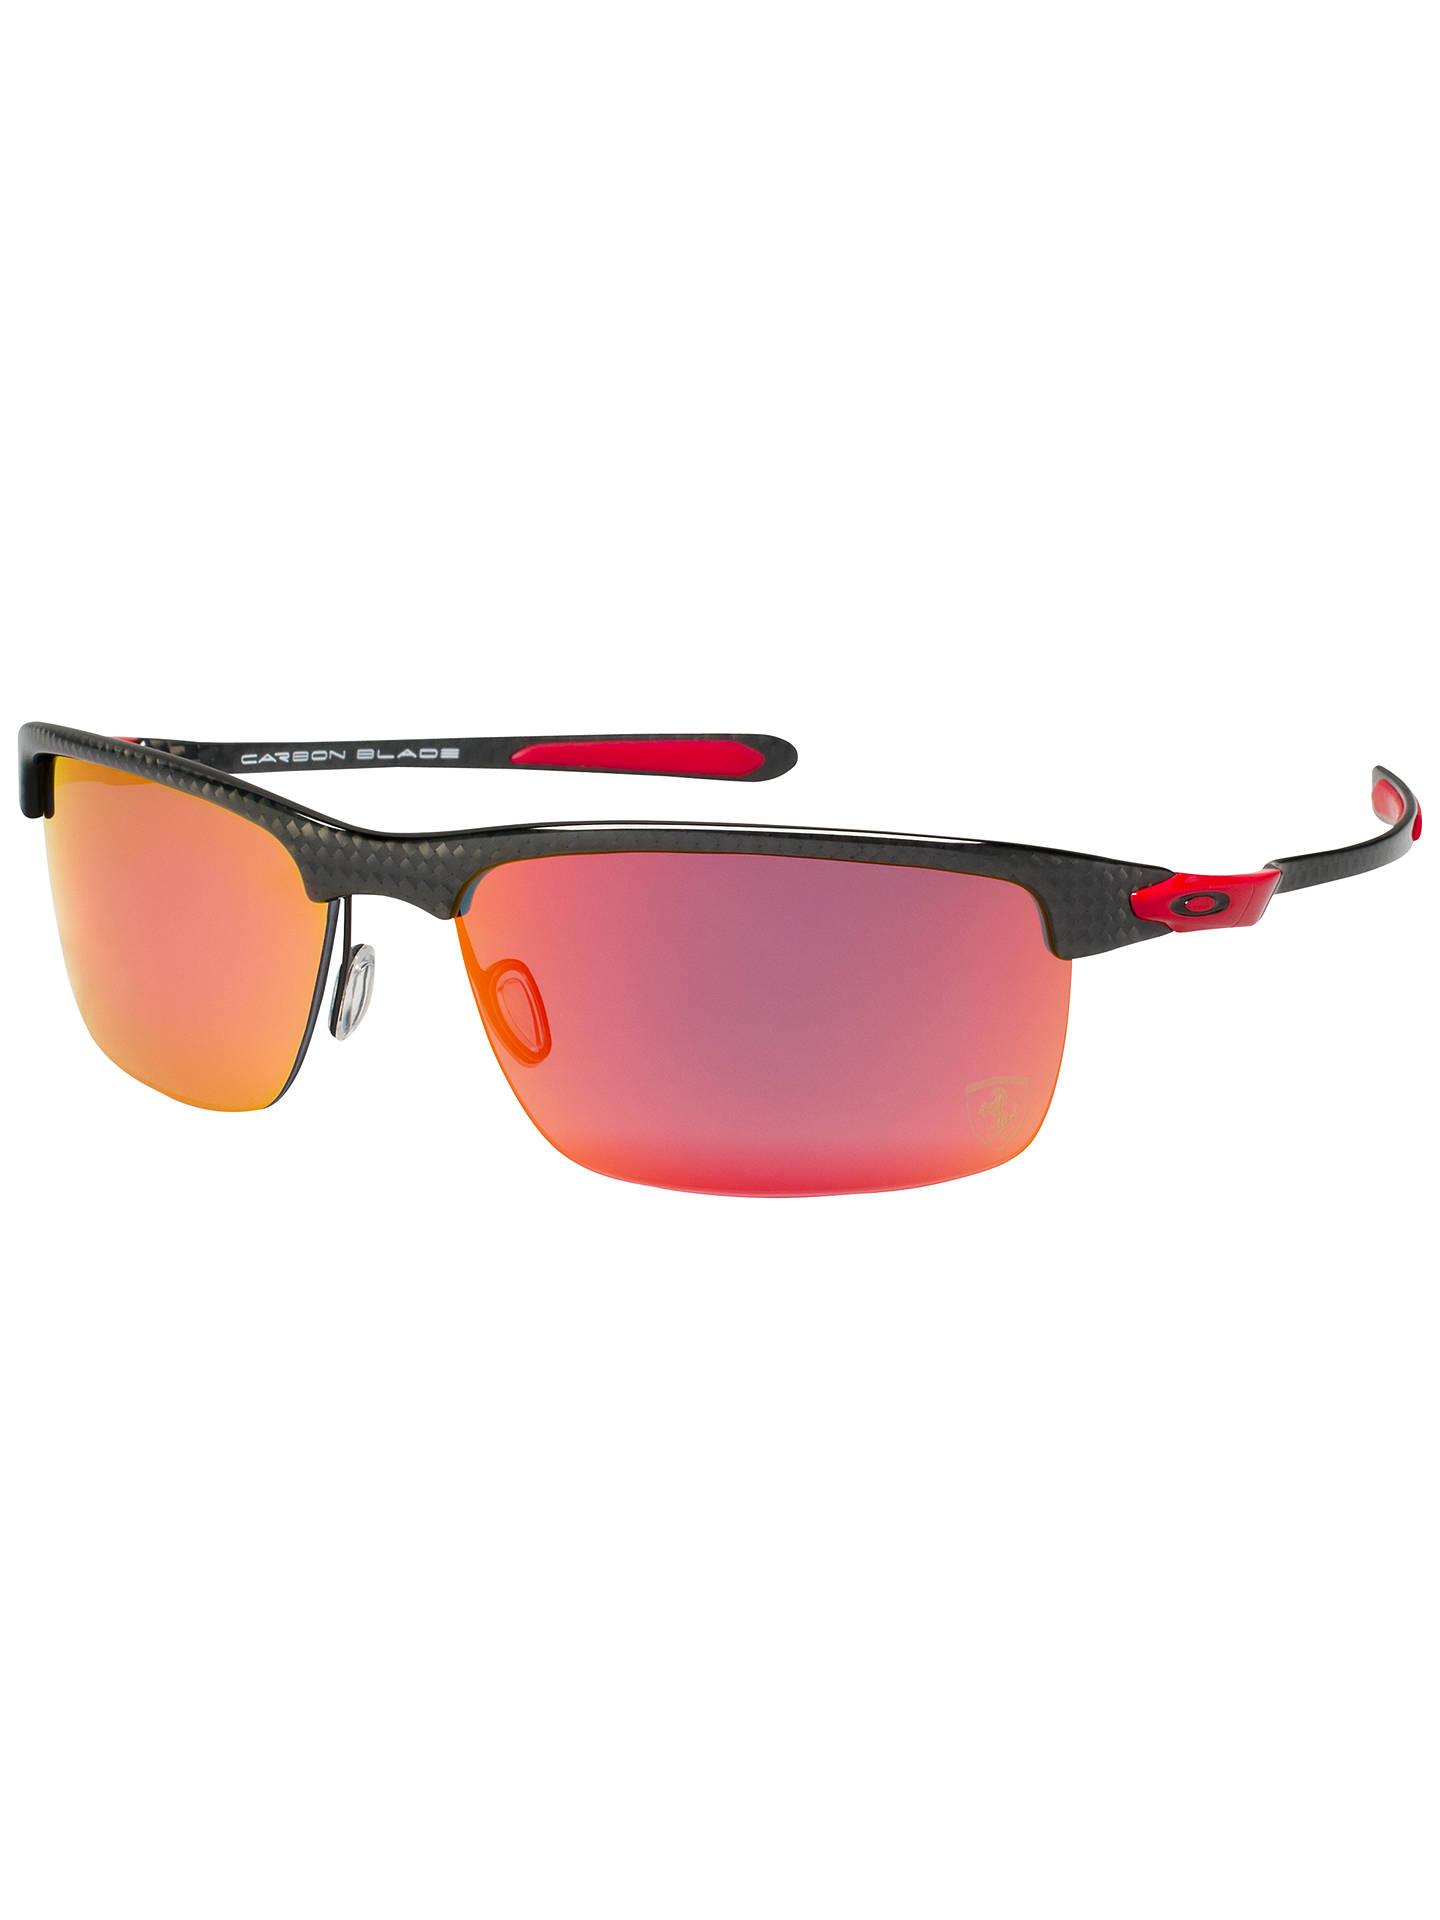 850da7b0ebb Buy Oakley OO9174 Carbon Blade Sunglasses